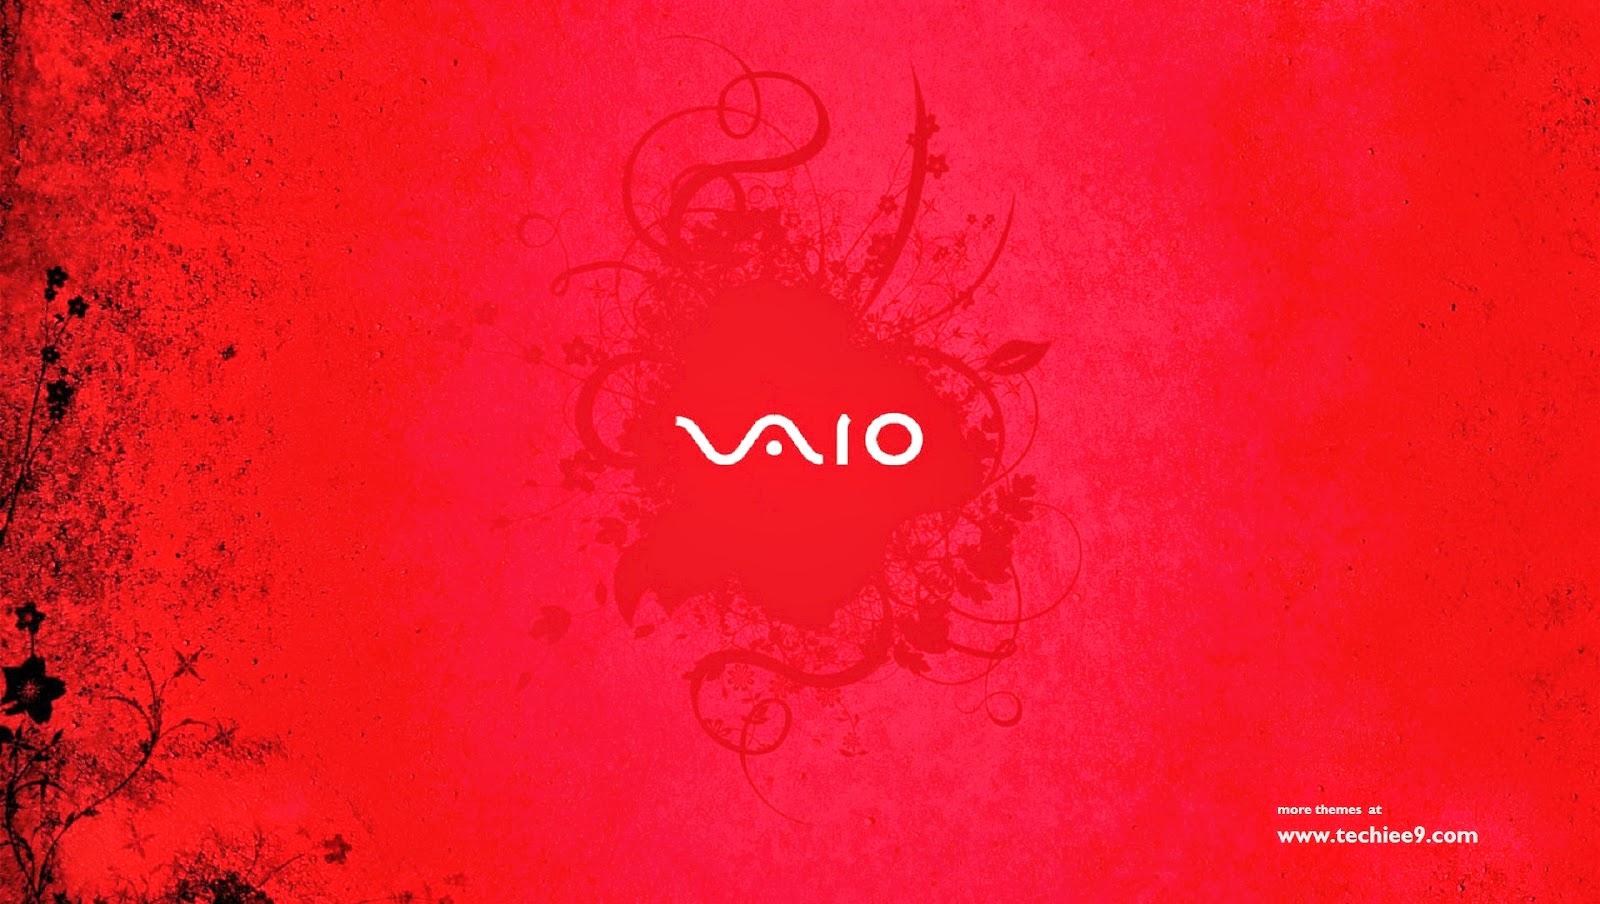 Sony Vaio full hd 1920x1080 widescreen wallpaper